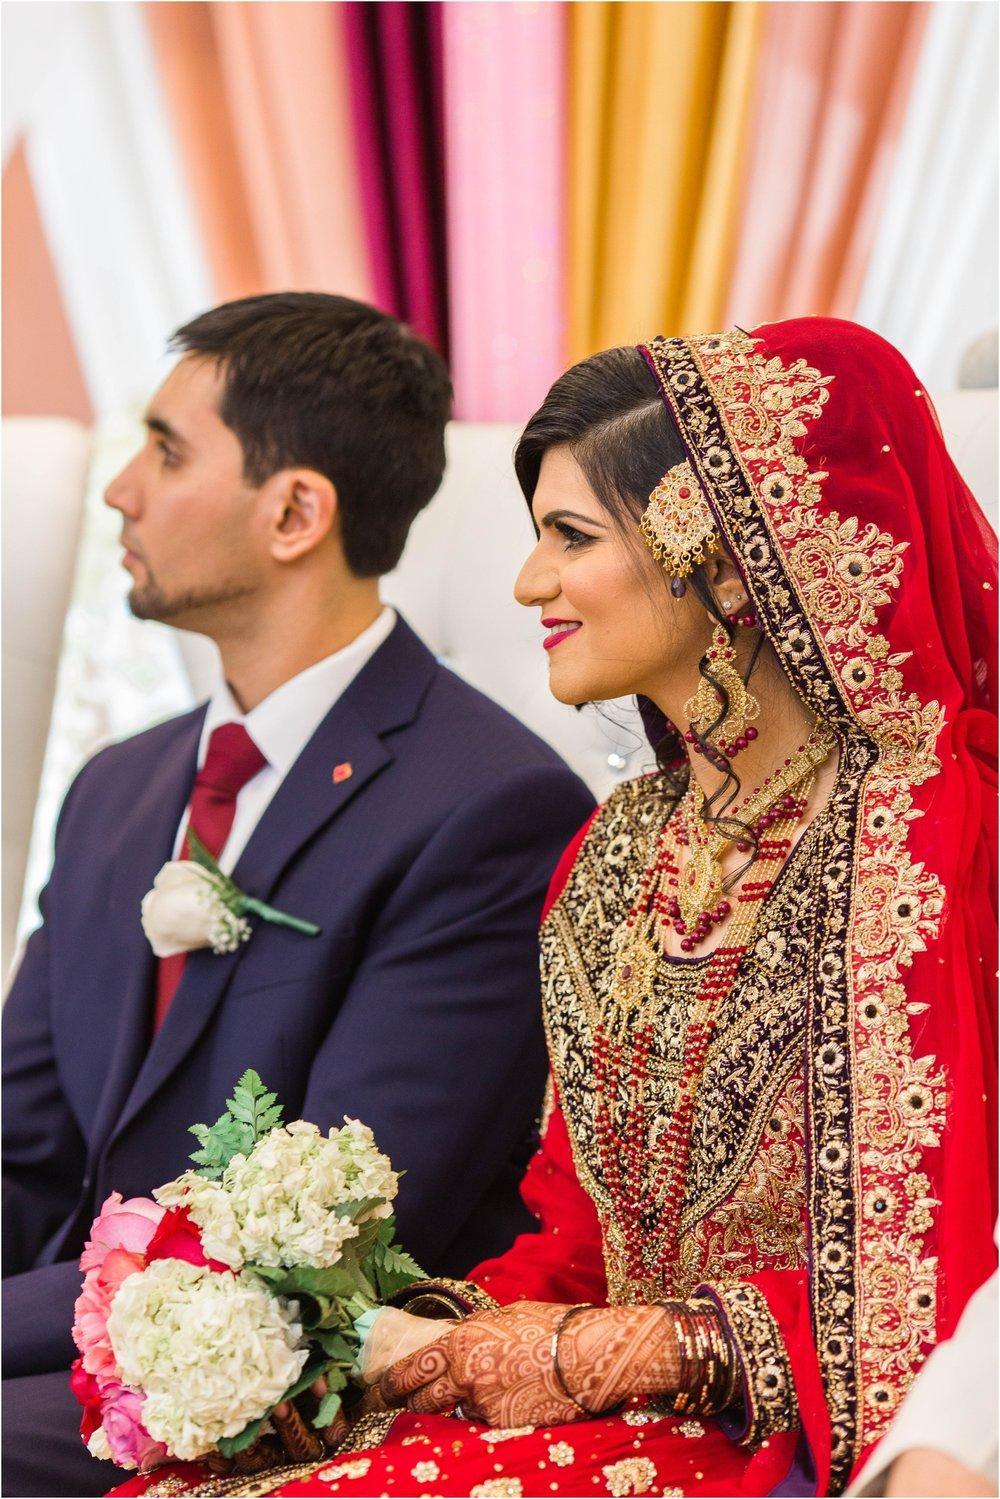 Estate-Banquet-Hall-Wedding-Toronto-Mississauga-Brampton-Scarborough-GTA-Pakistani-Indian-Wedding-Engagement-Photographer-Photography_0030.jpg